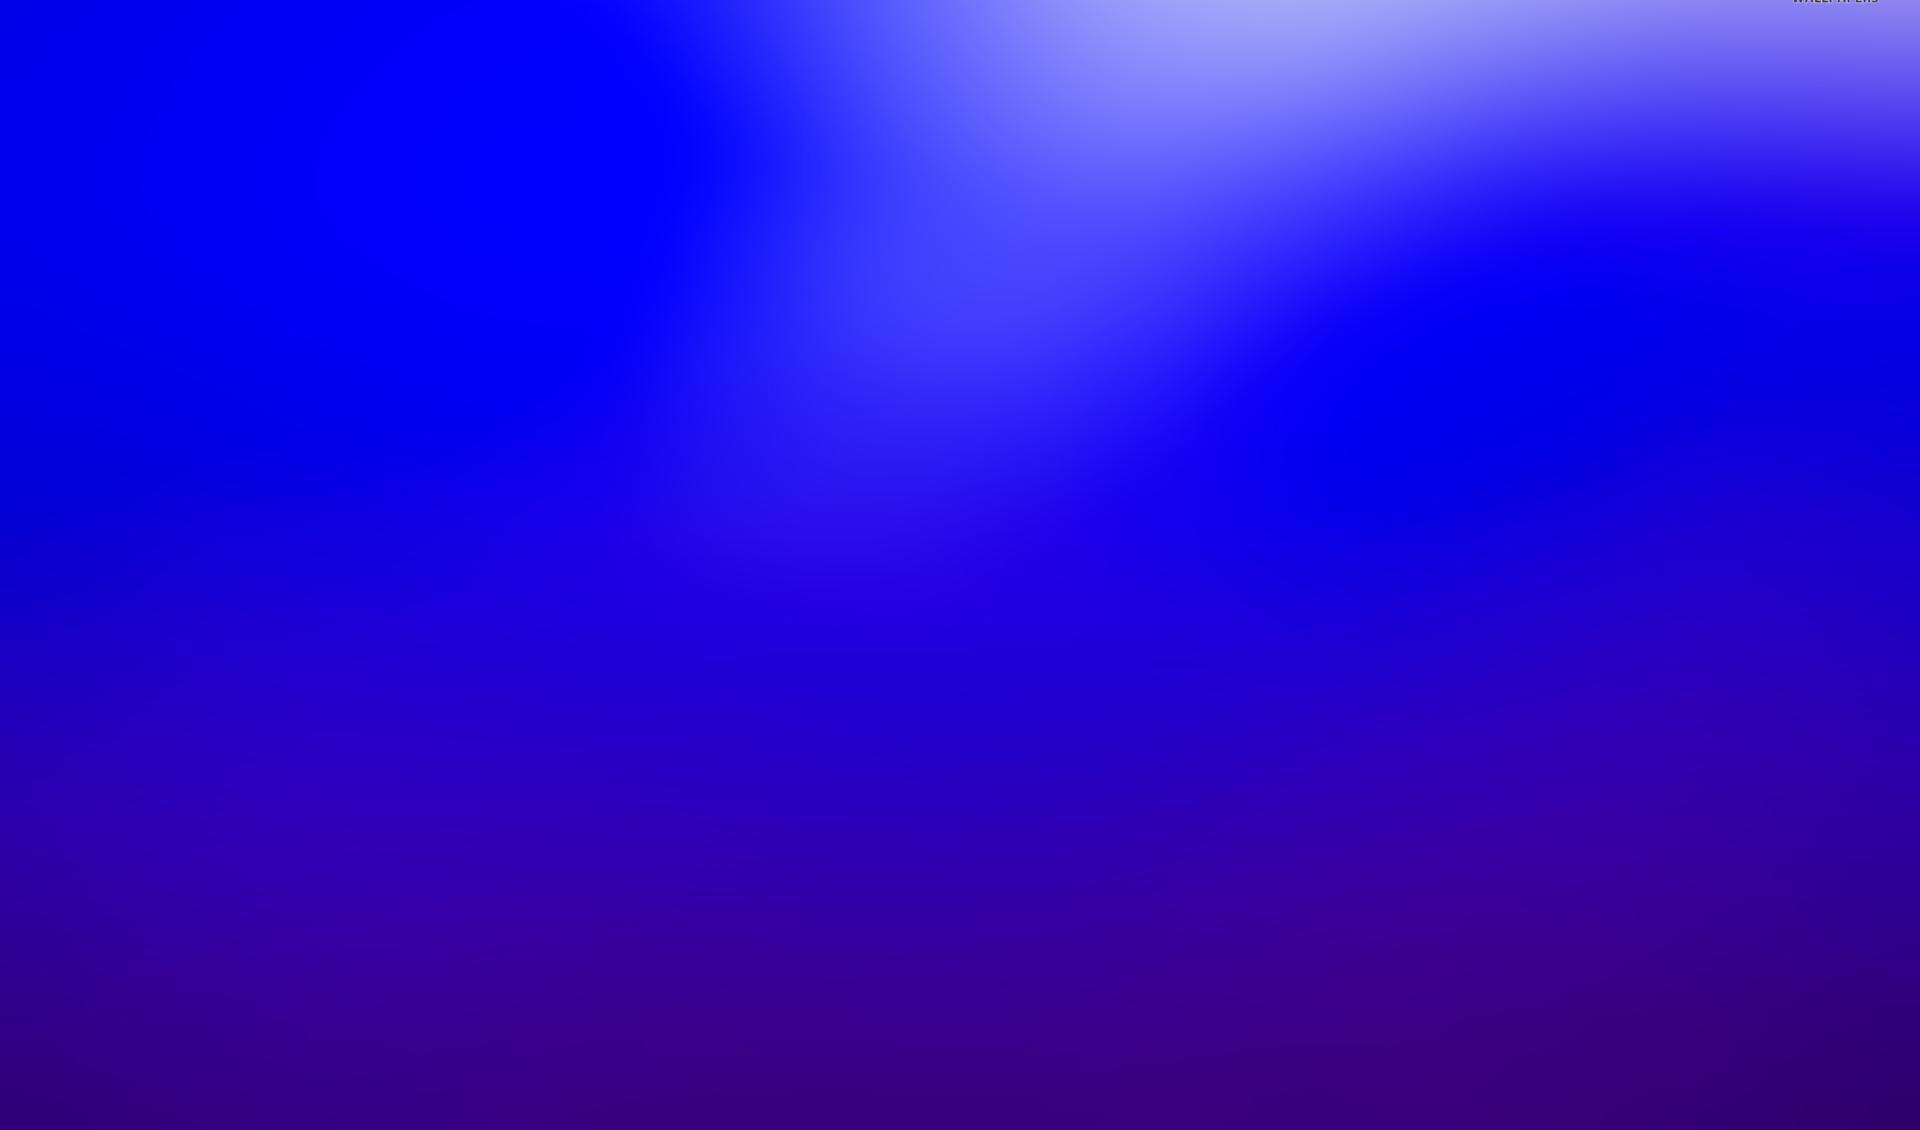 Blue gradient wallpapers HD